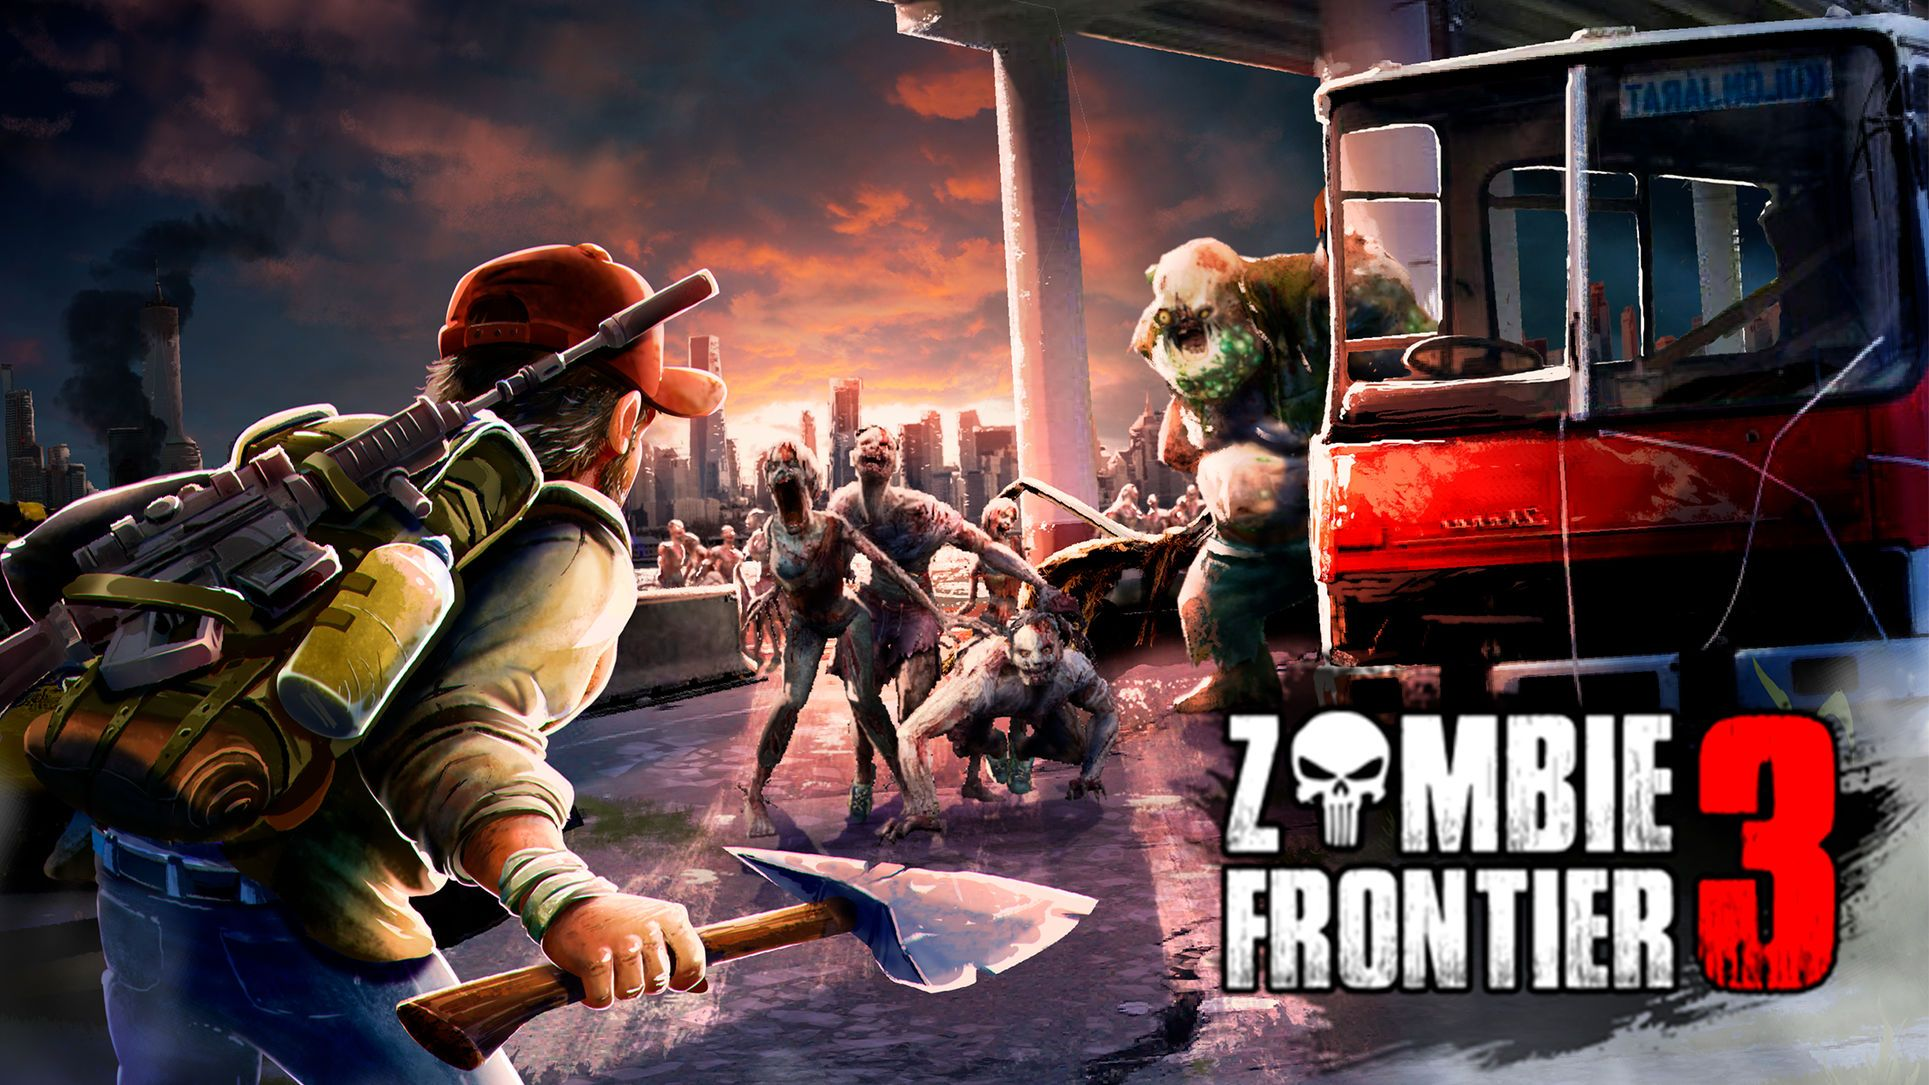 Zombie Frontier 3 Sniper Fps Action Games Adventure Ios New